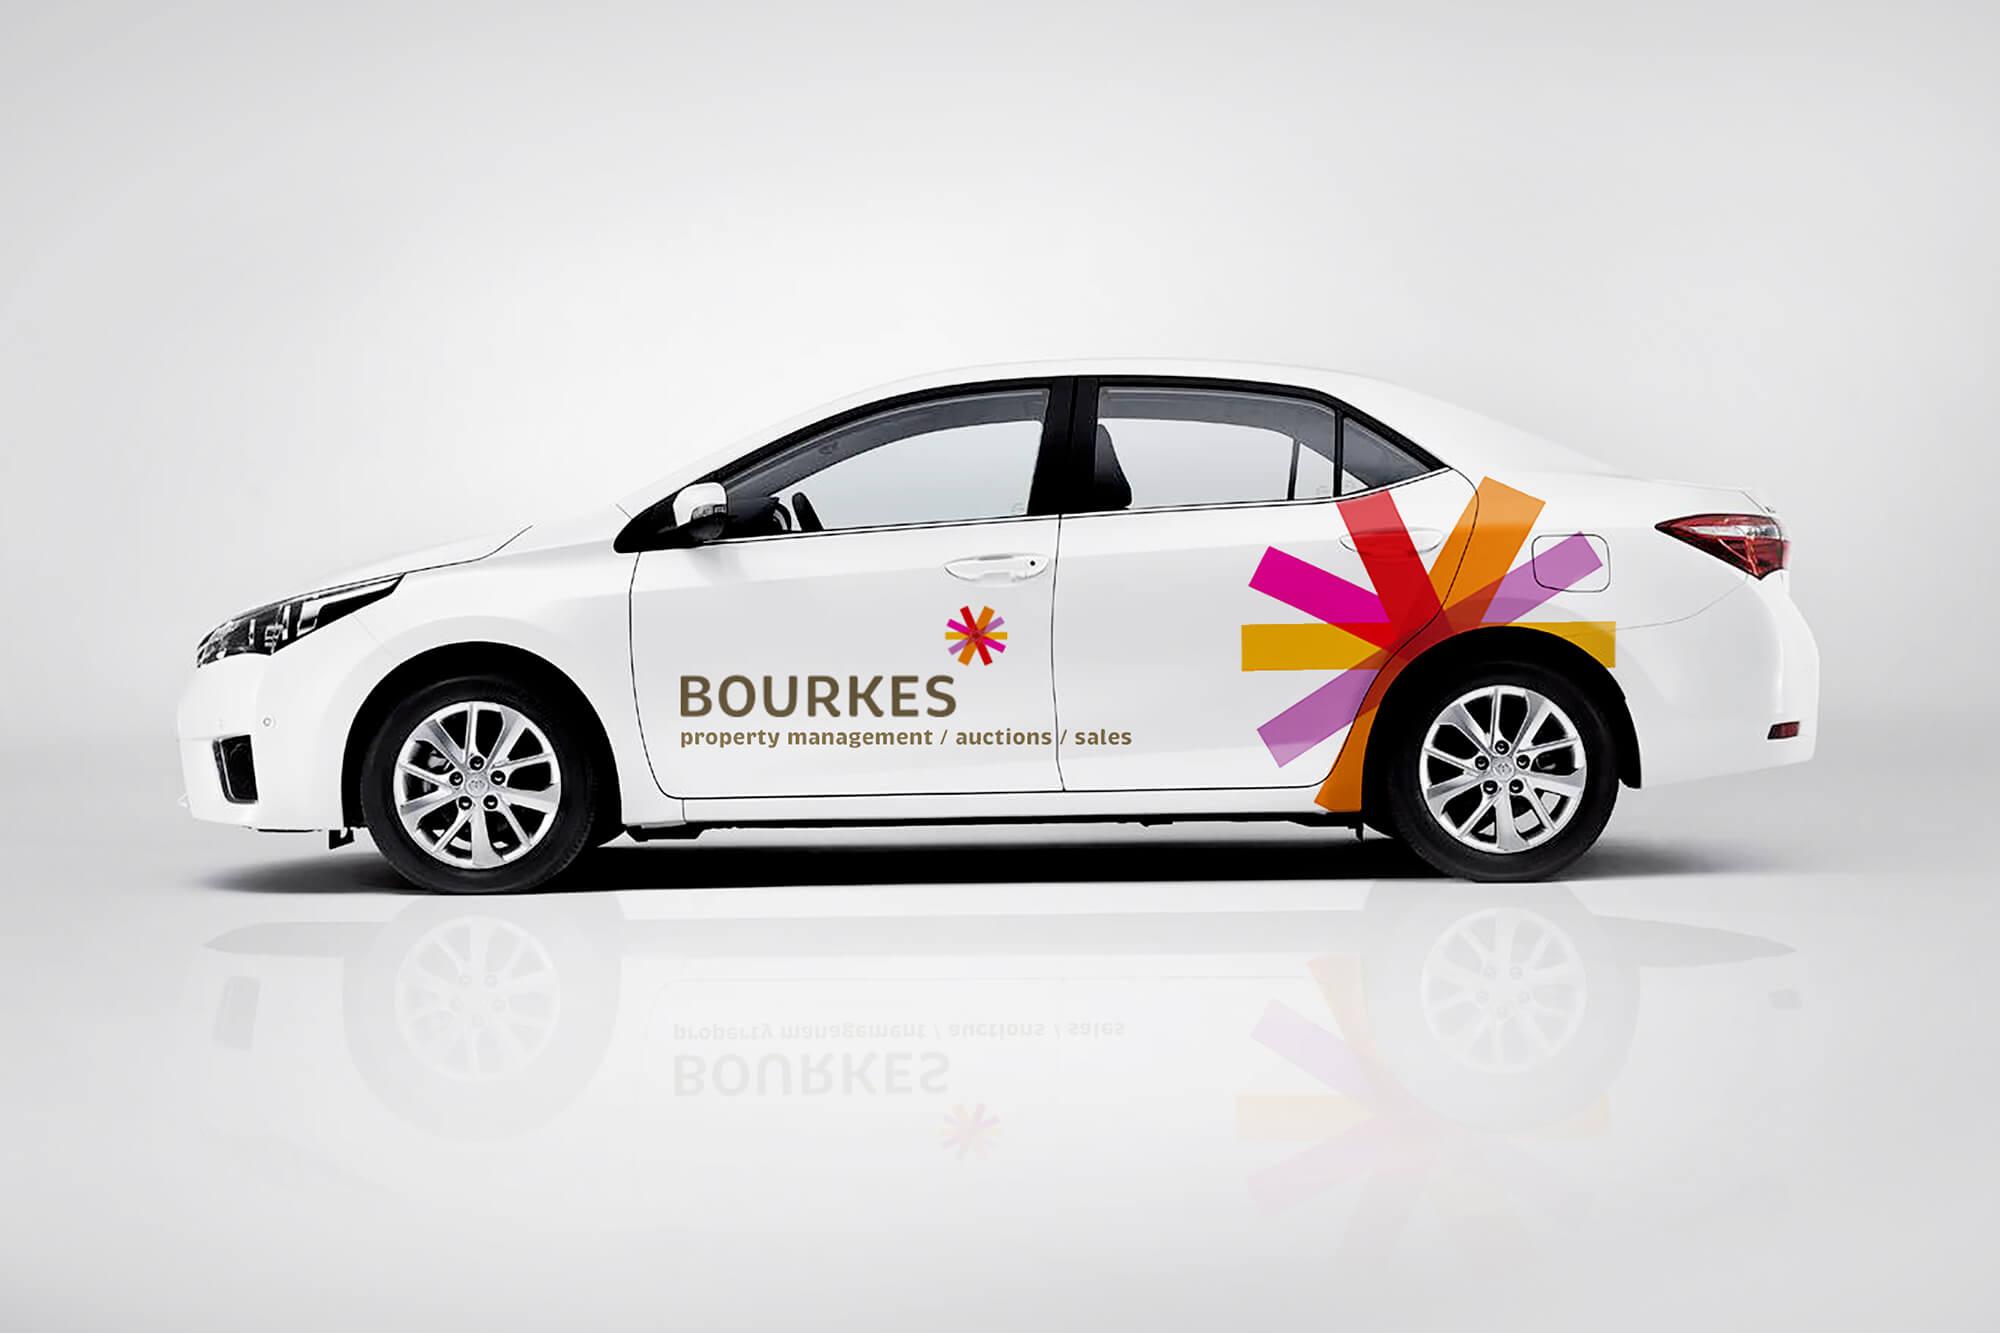 bourkes-realestate-vehicle